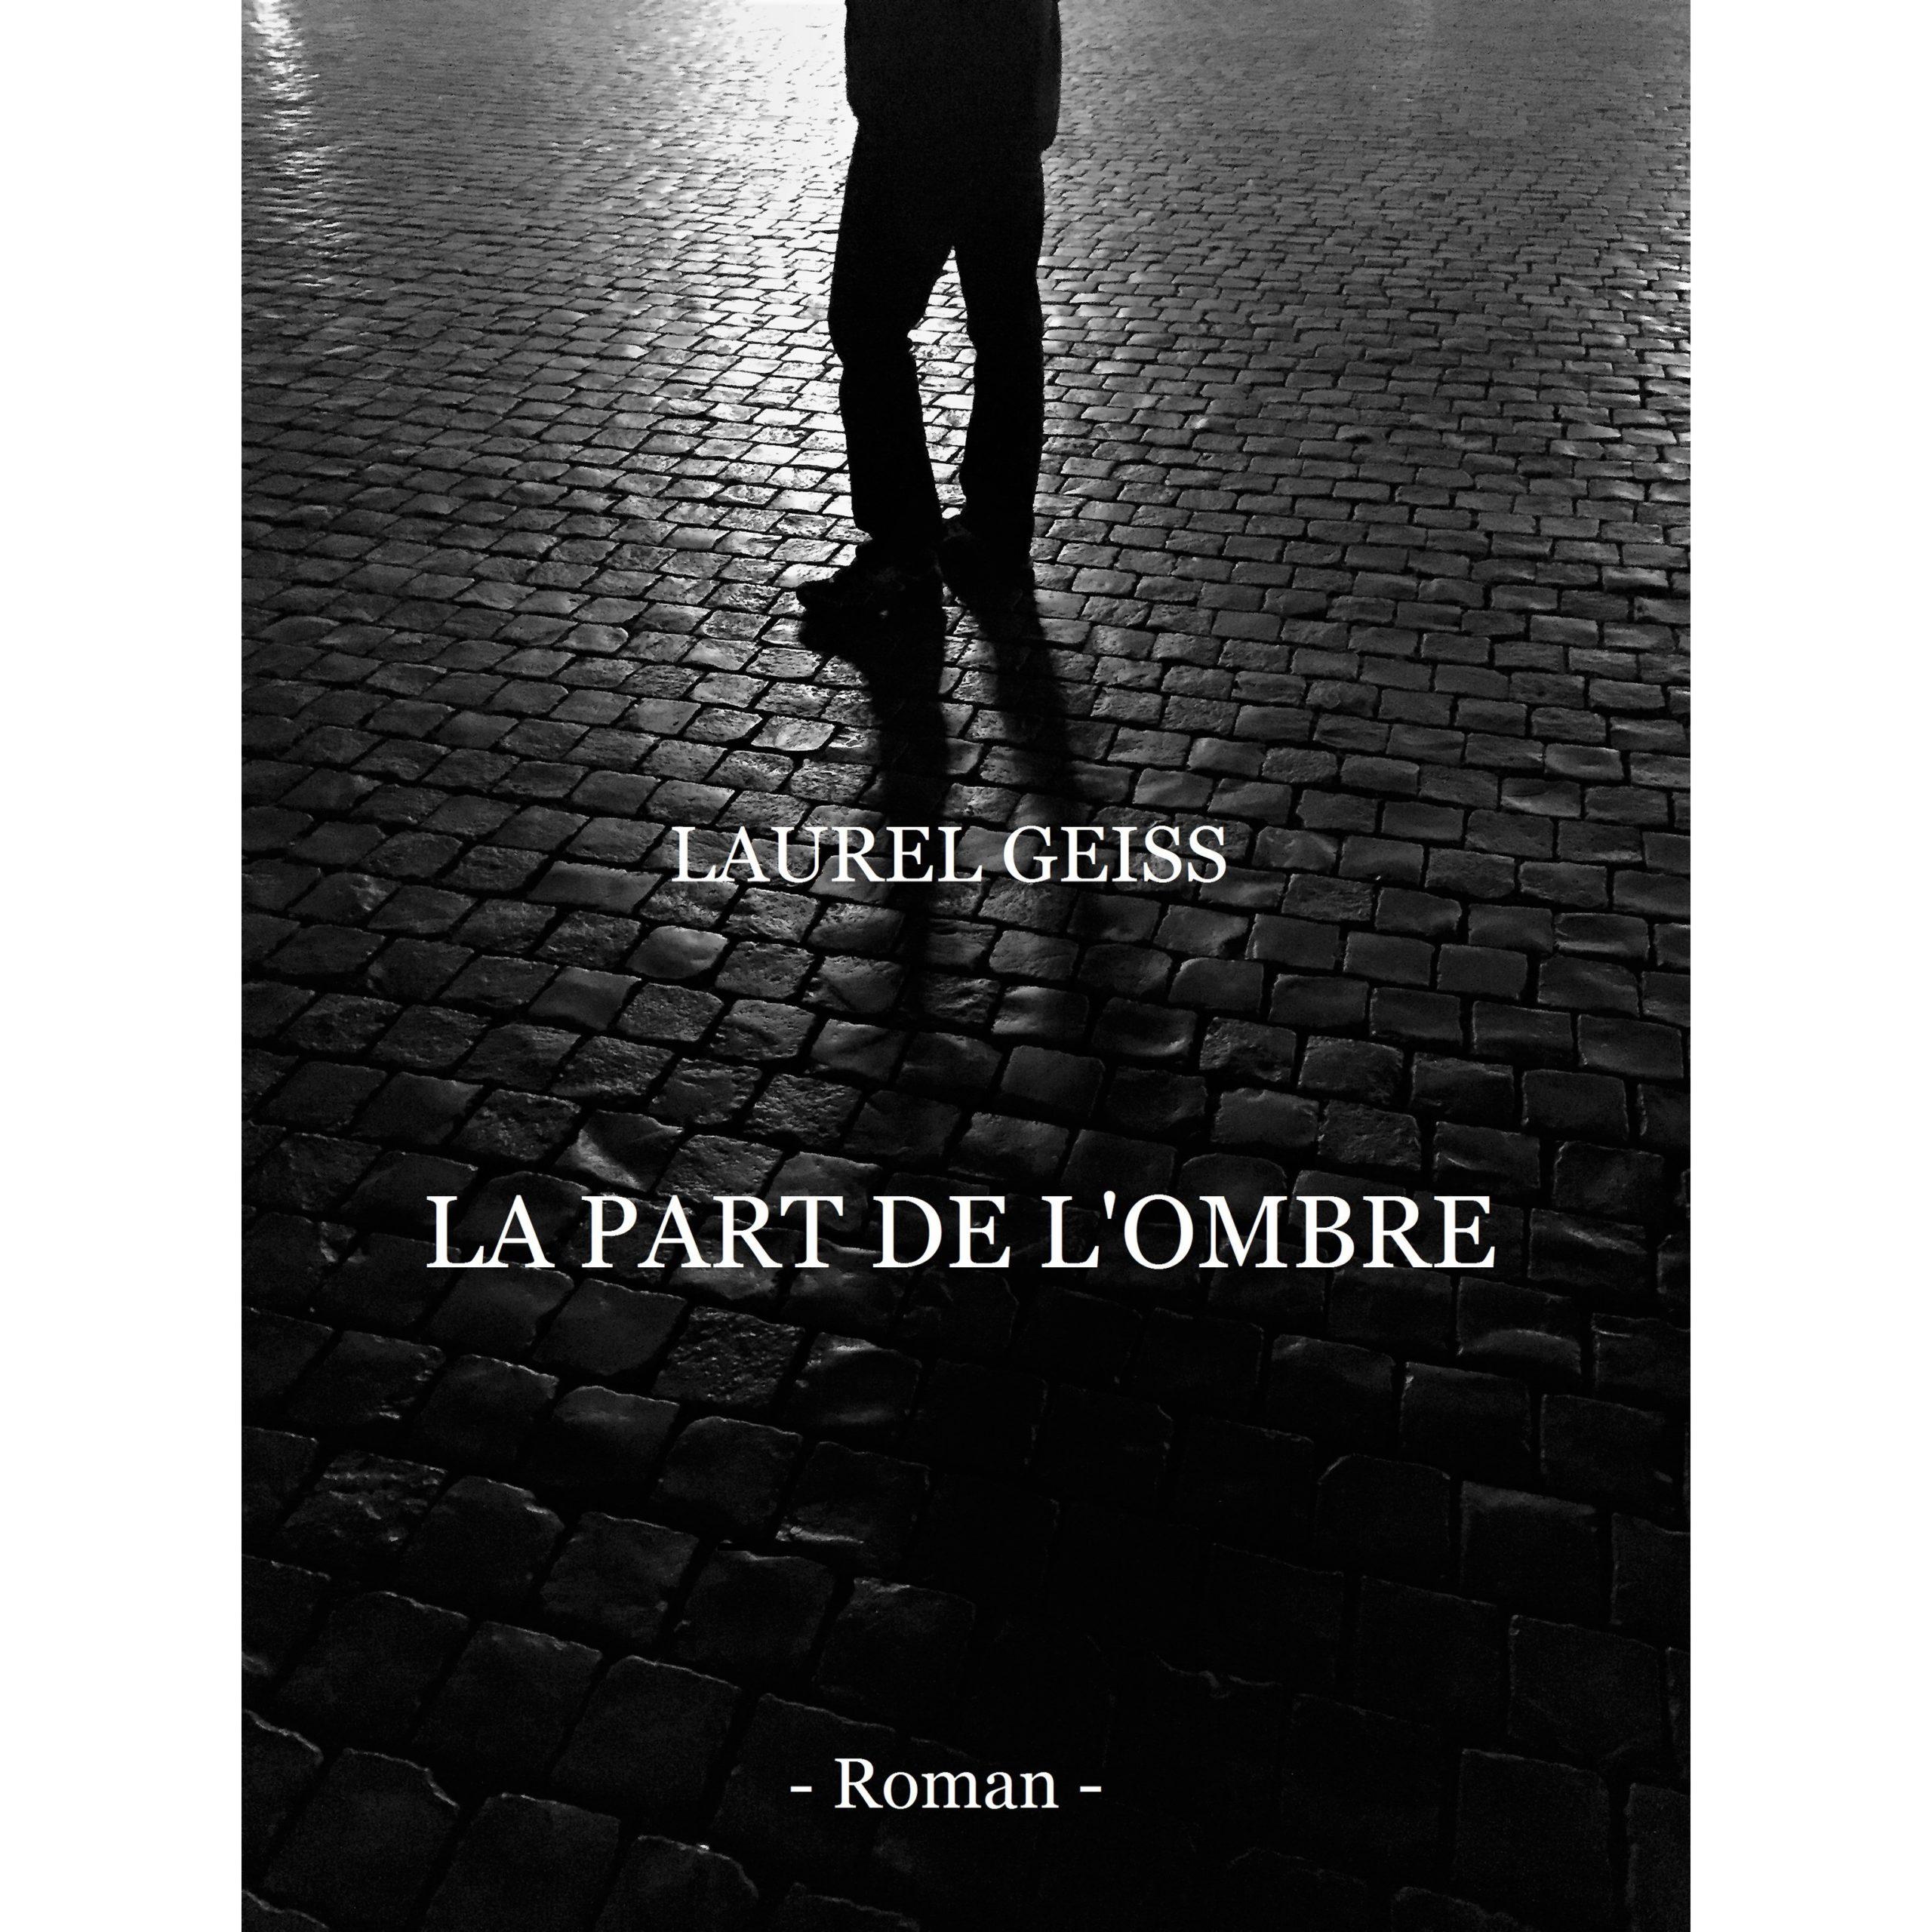 La part de l'ombre – Laurel Geiss